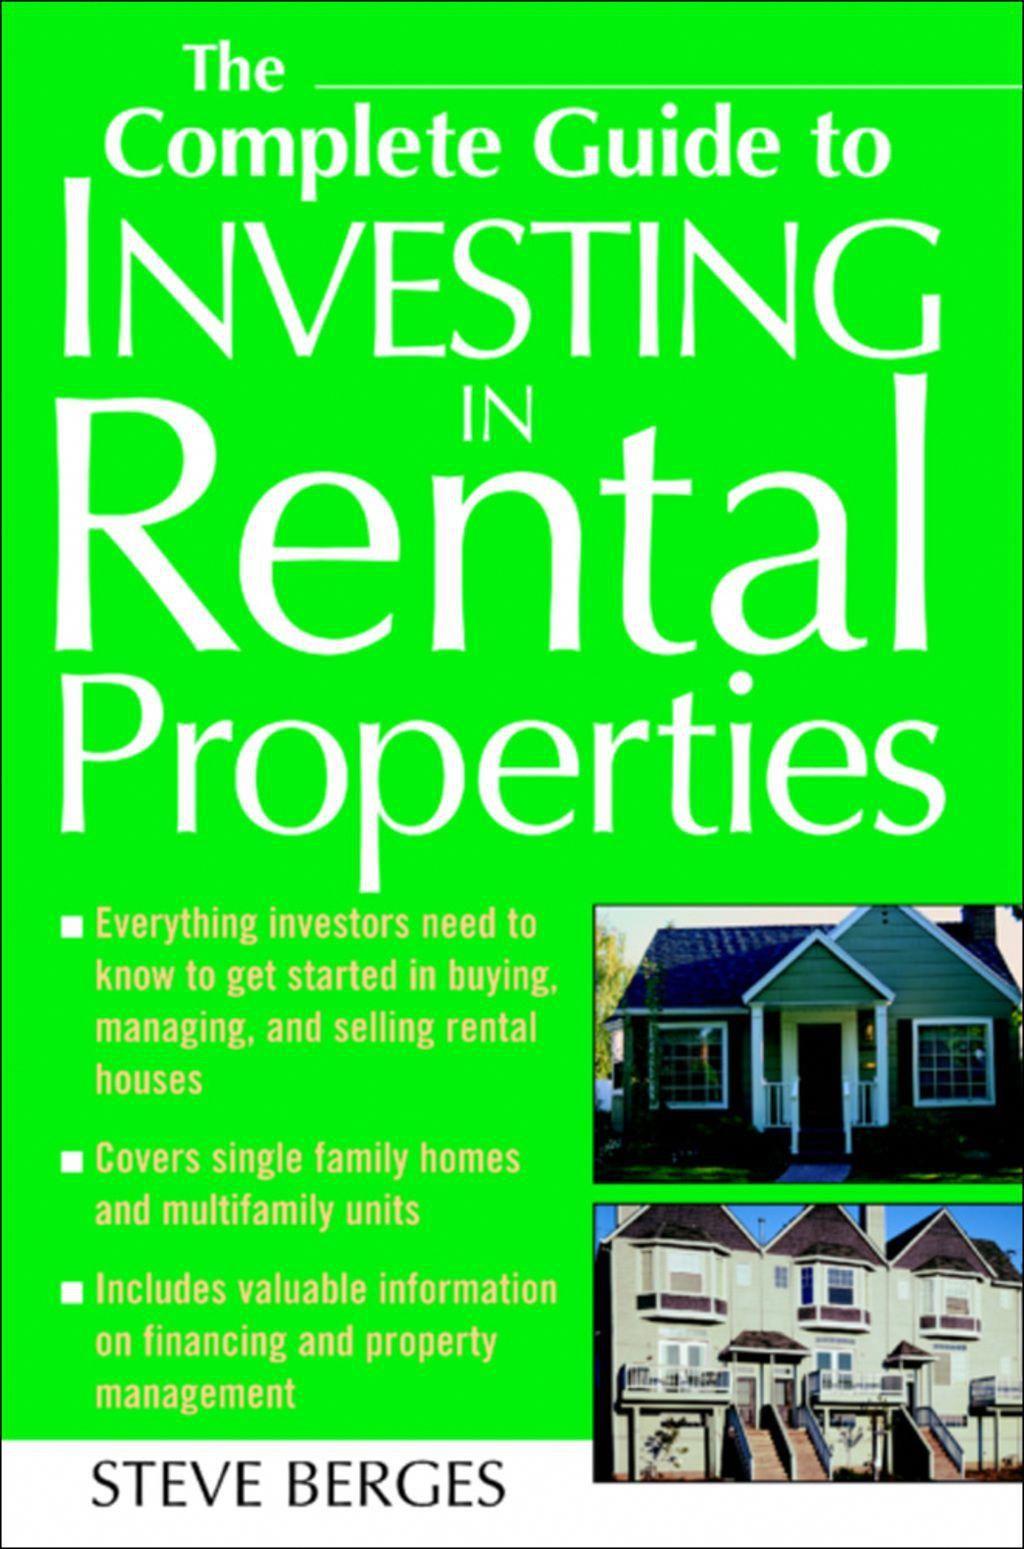 Trabajos Online Para Estudiantes Trabajosmanualesdesdecasa Rental Property Investment Real Estate Investing Rental Property Investing